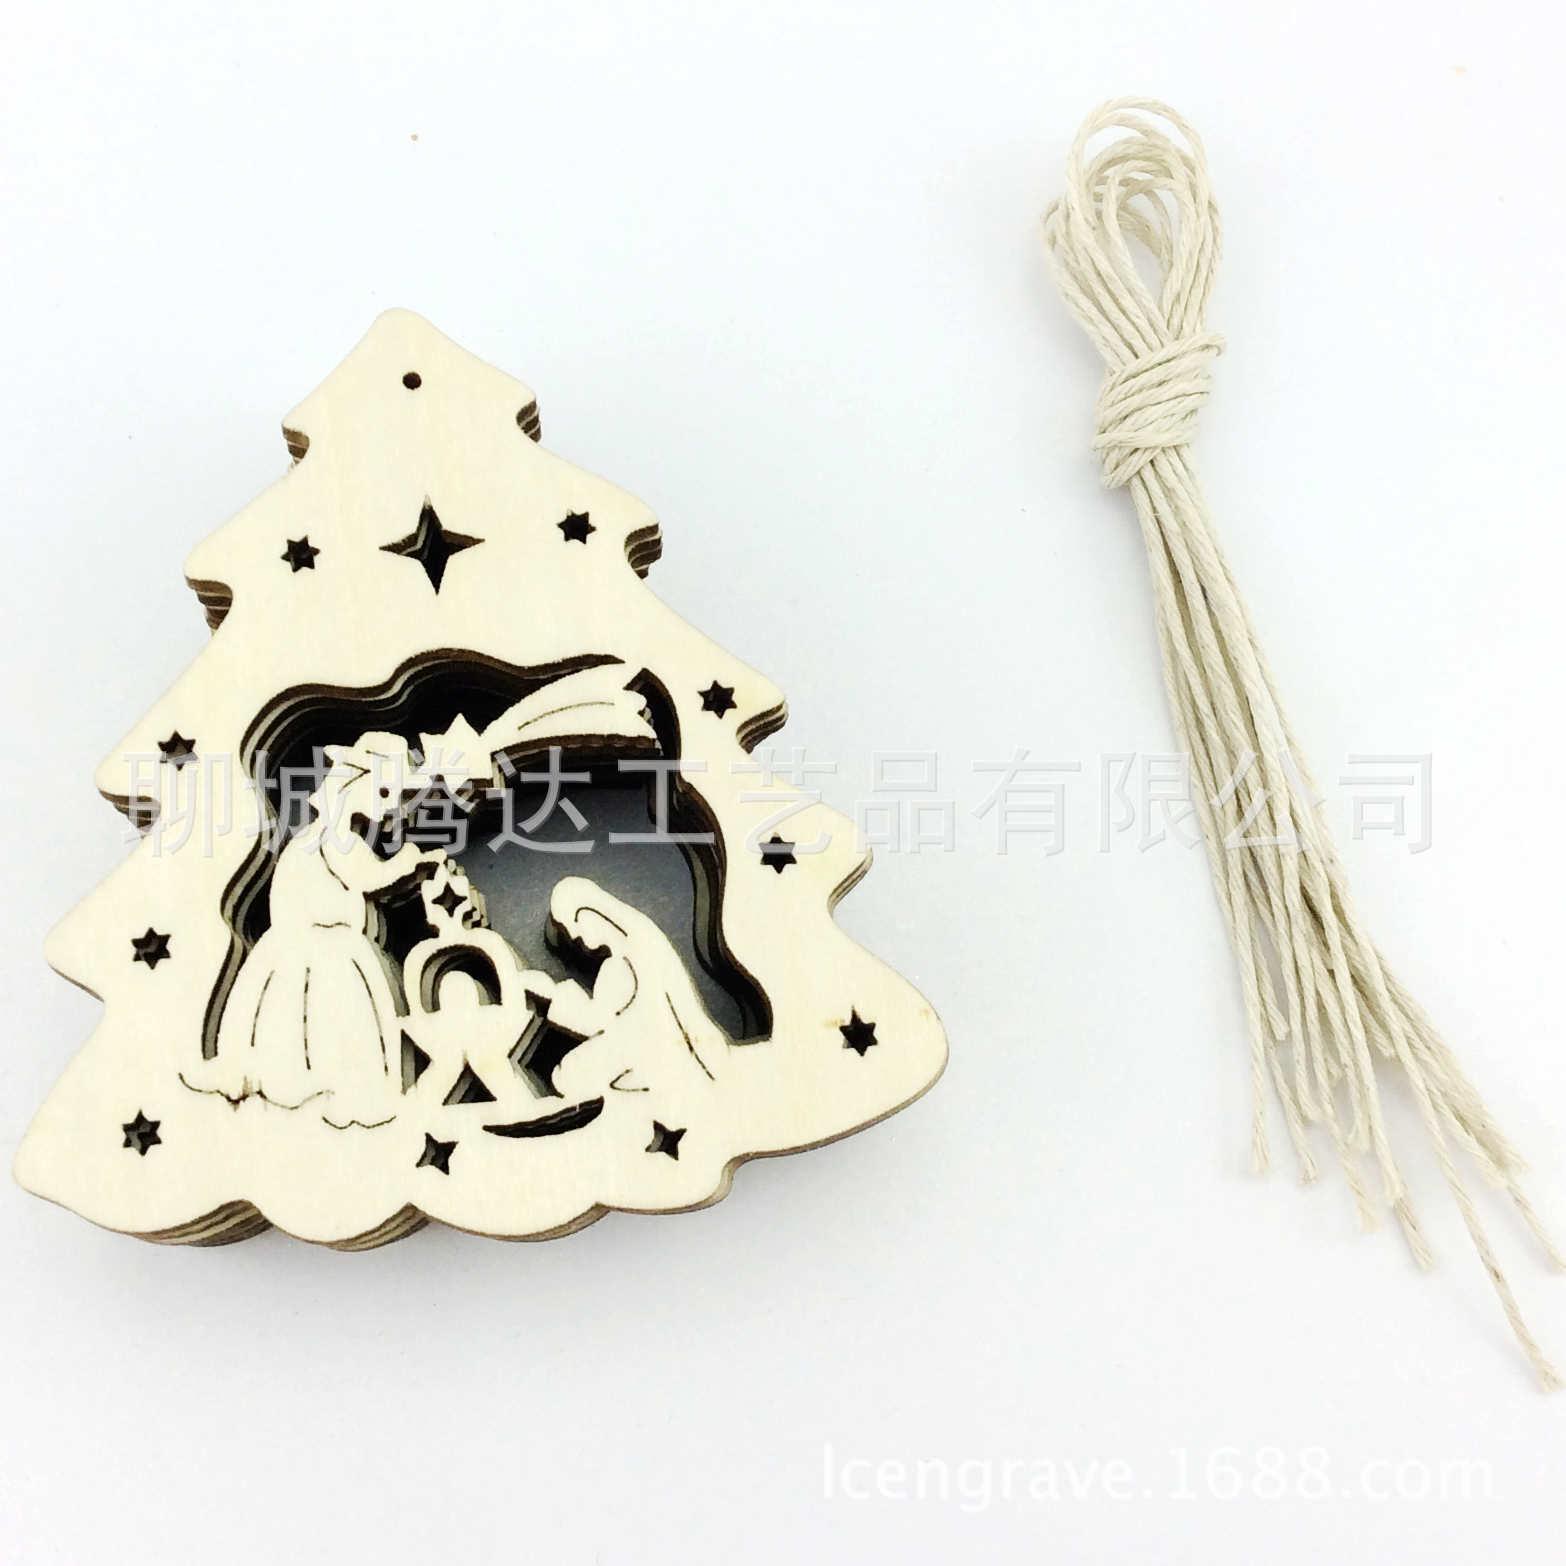 SD-018圣诞雪花 圣诞节礼物 创意圣诞五星挂件 木质吊牌 外贸热卖